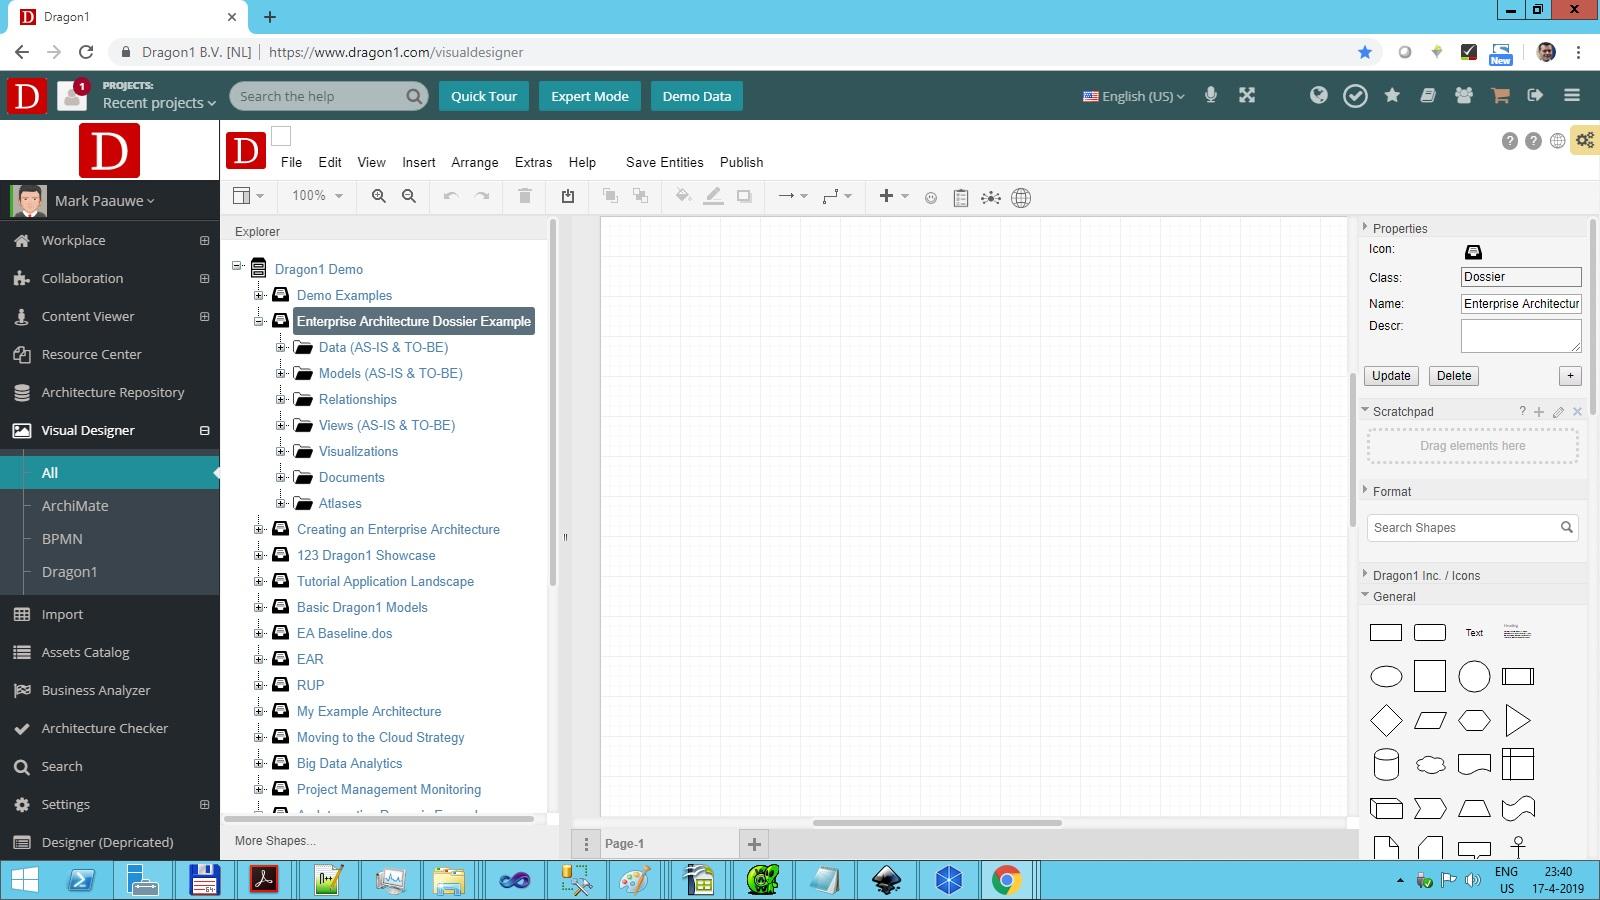 dragon1 folder visual designer